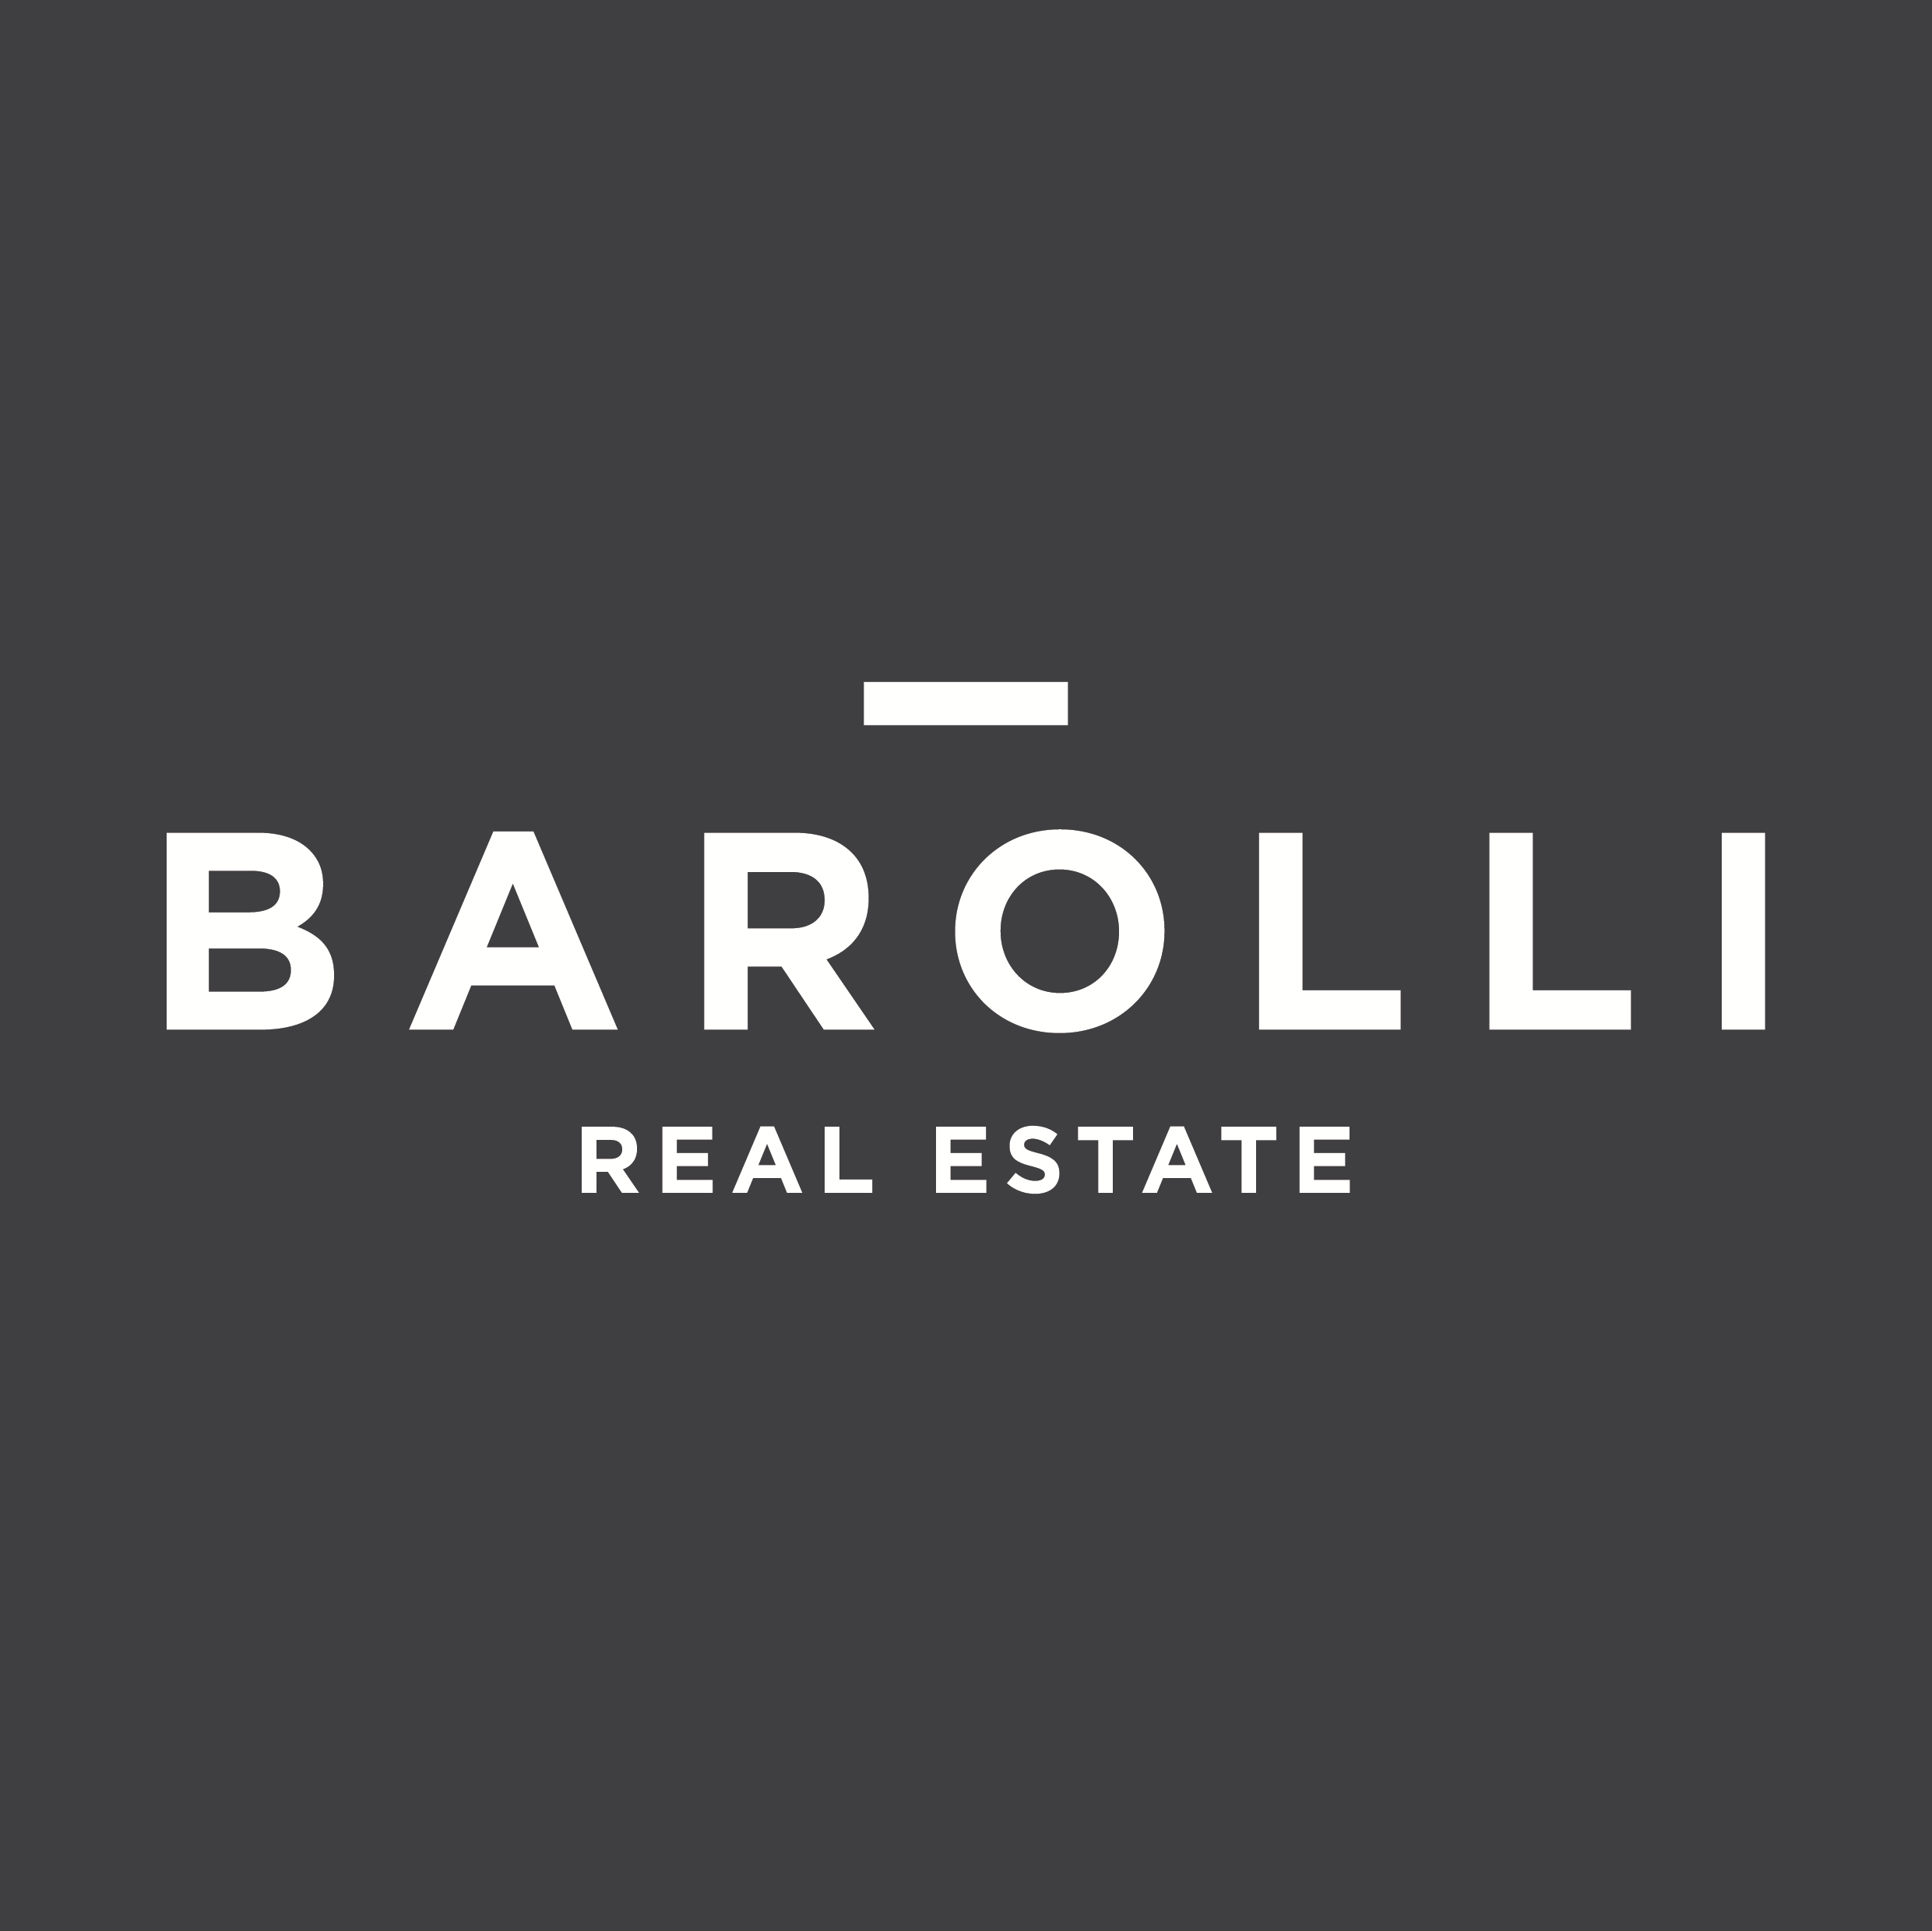 Barolli Real Estate, Shepparton, 3630